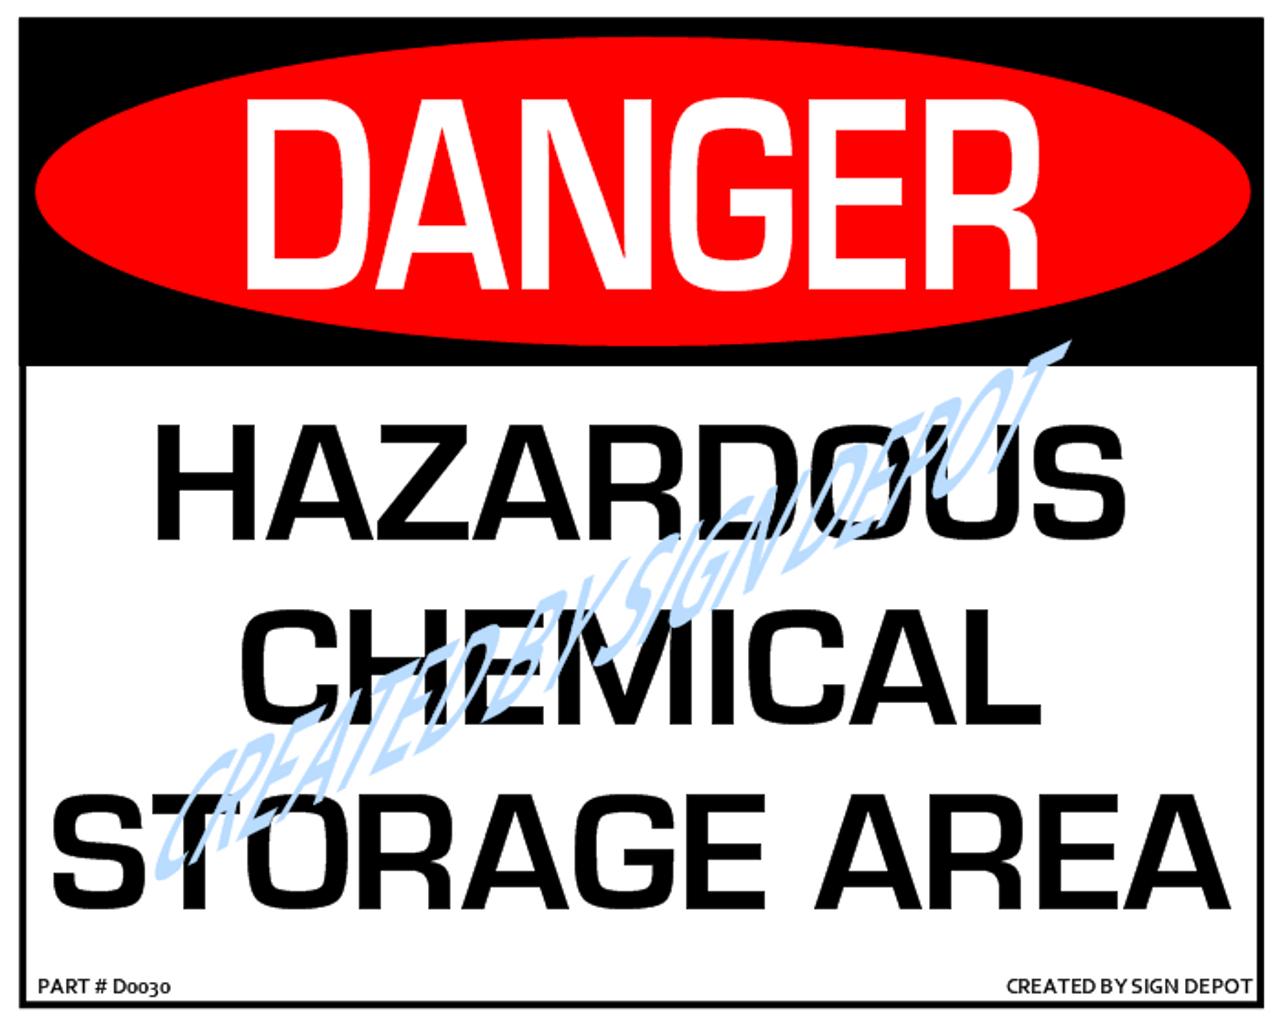 Danger, Hazardous Chemical Storage Area Sign, Download - 8